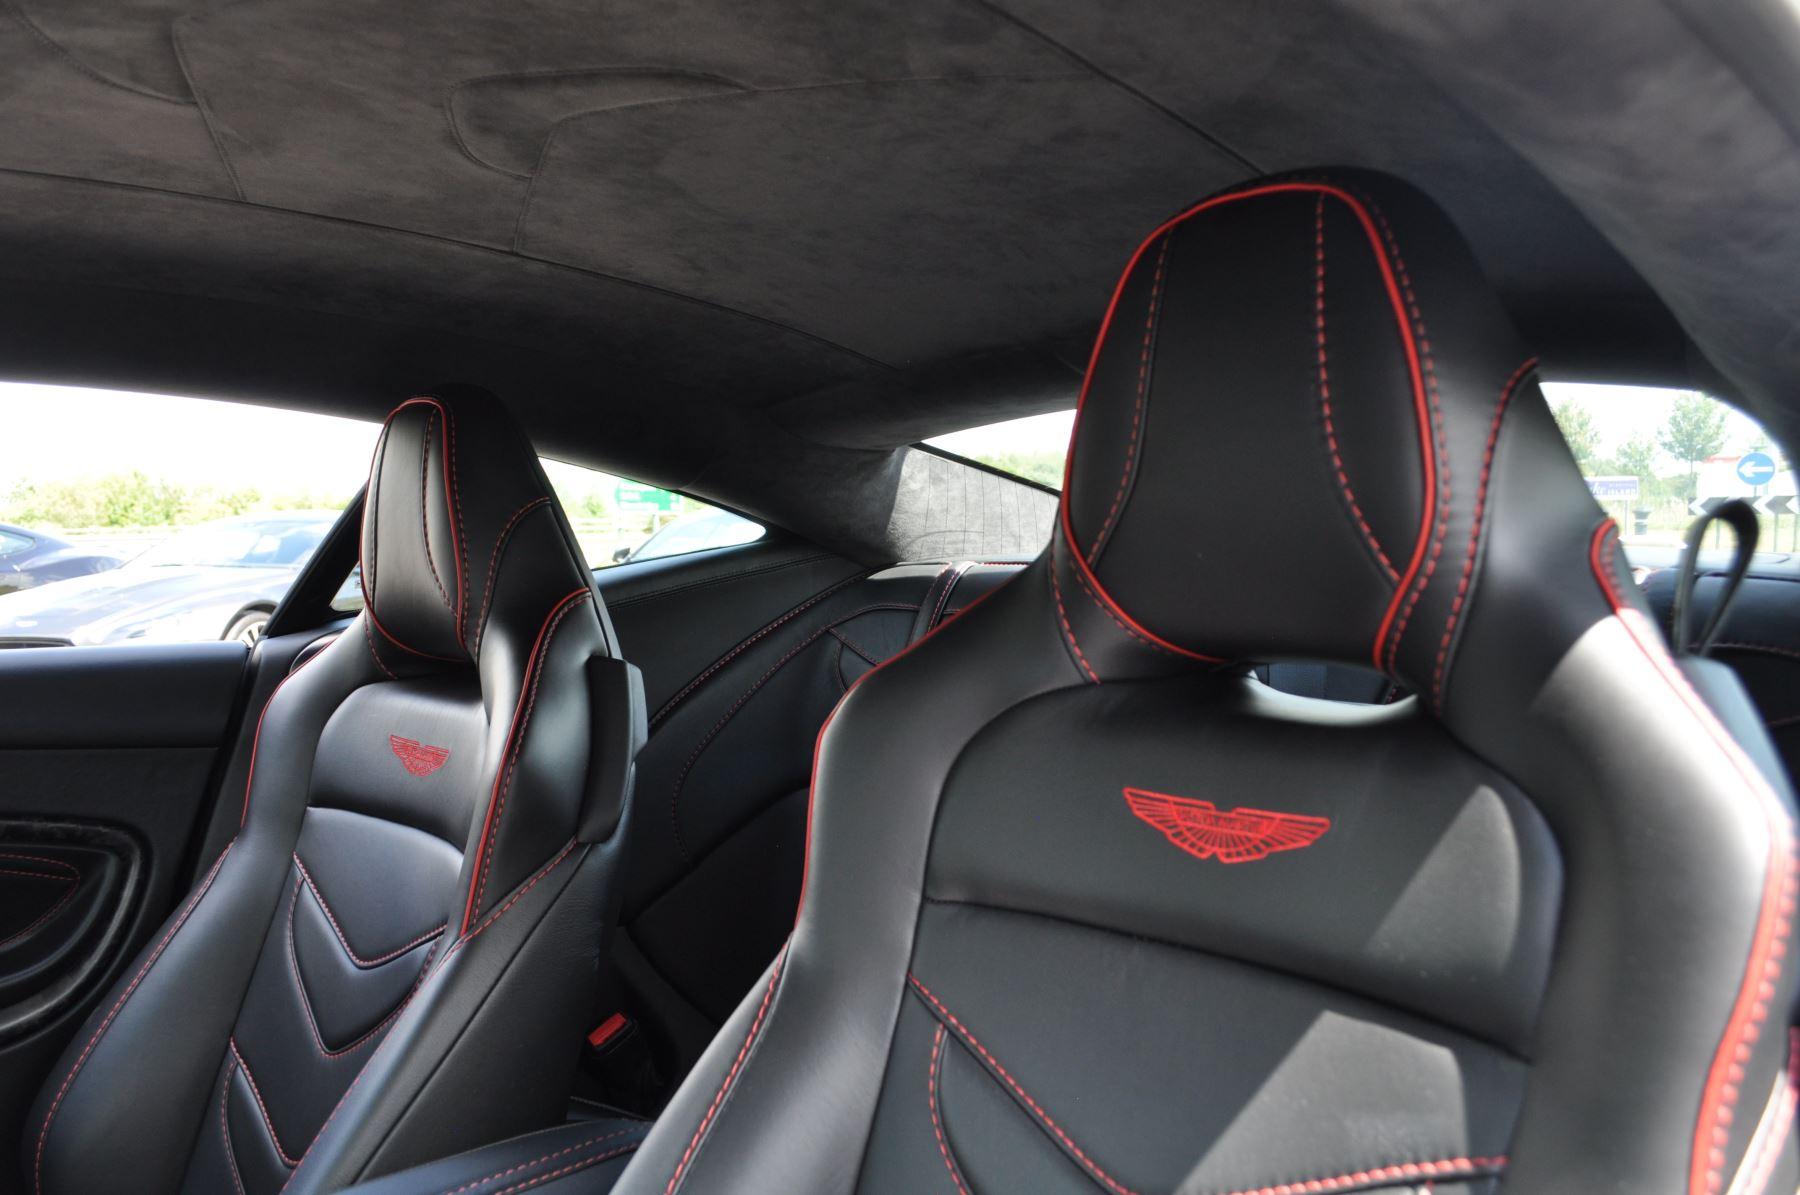 Aston Martin DBS V12 Superleggera Touchtronic image 12